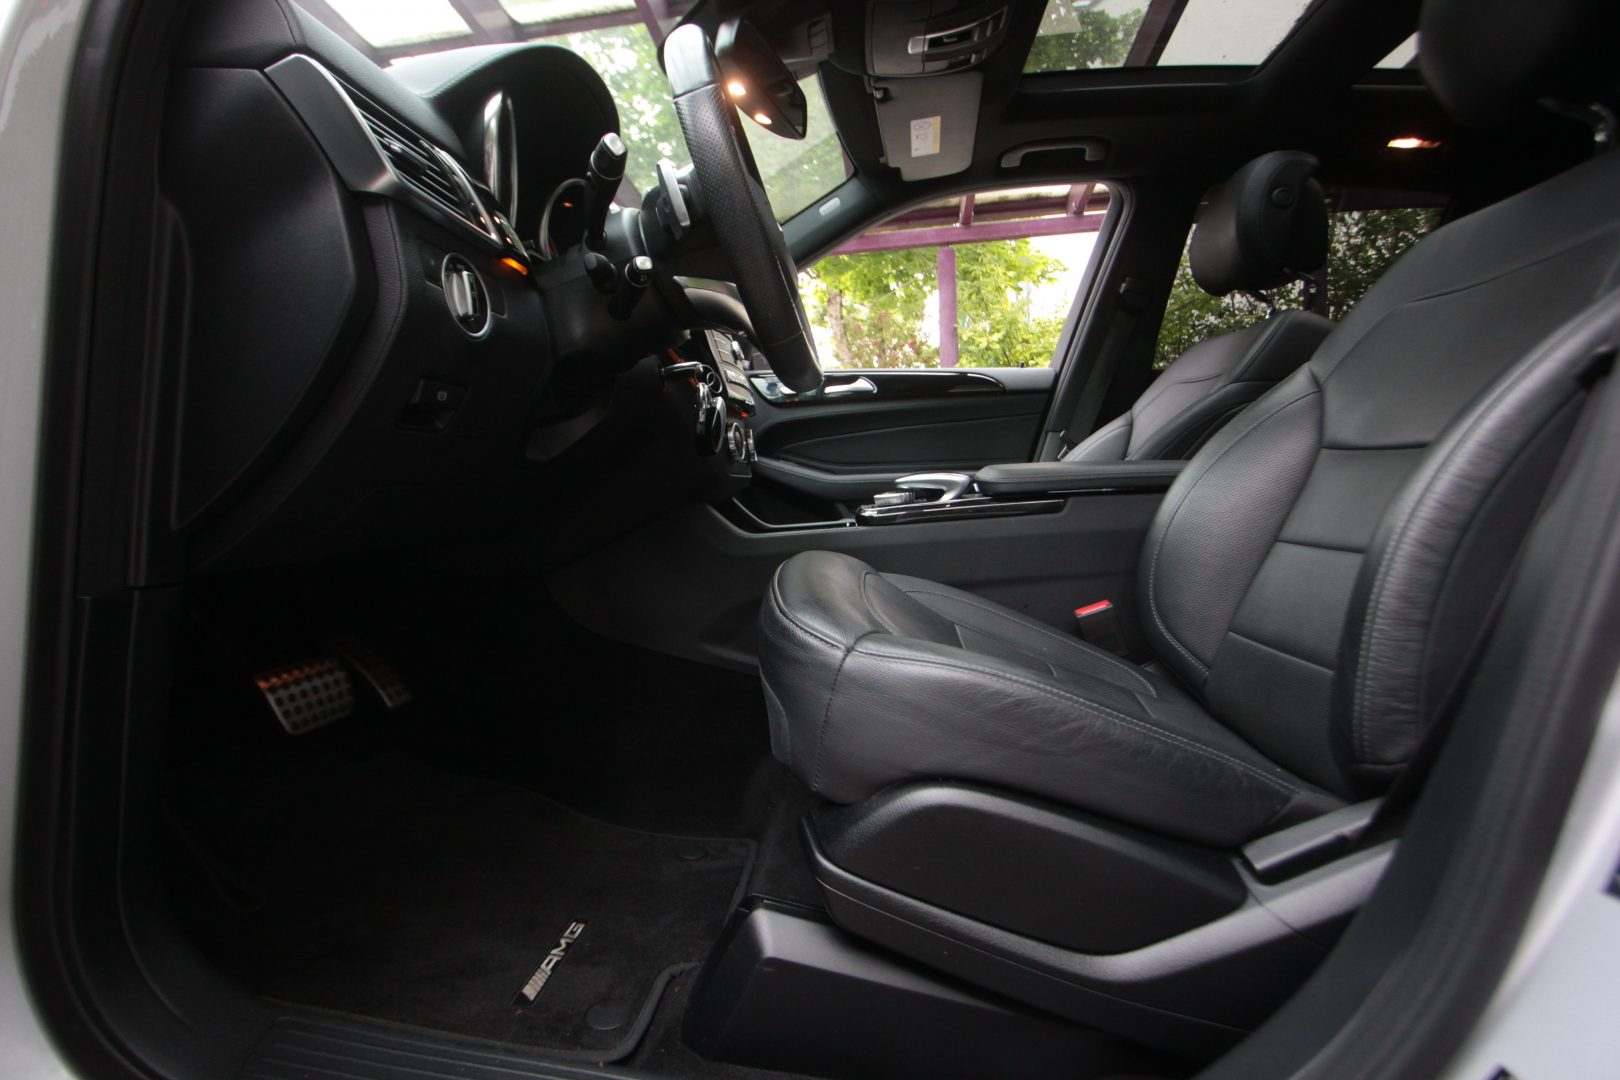 AIL Mercedes-Benz GLE 450 AMG 4Matic 12